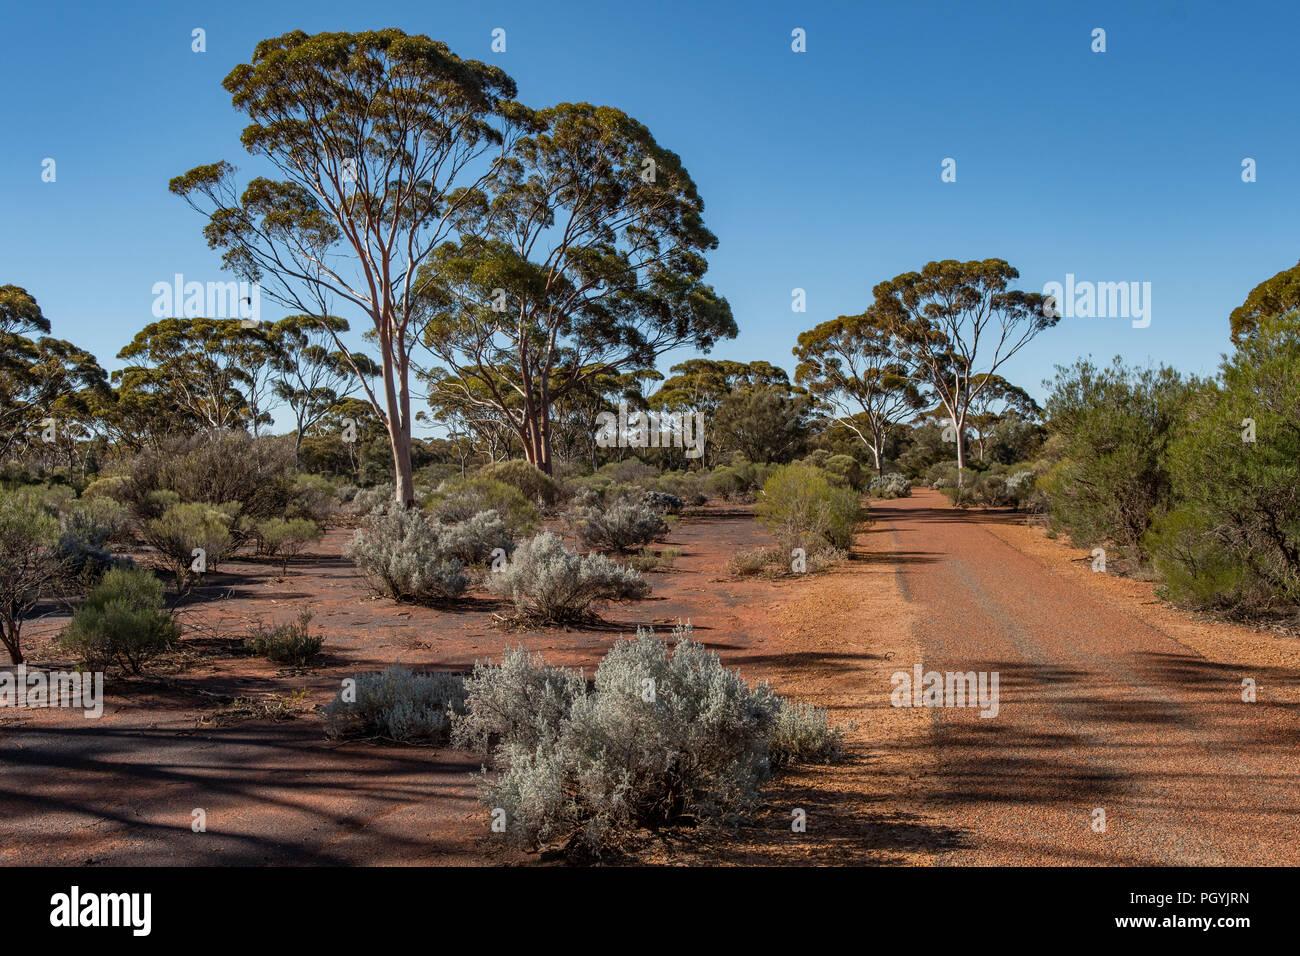 Karlkurla Bushland Park, Kalgoorlie, WA, Australia - Stock Image